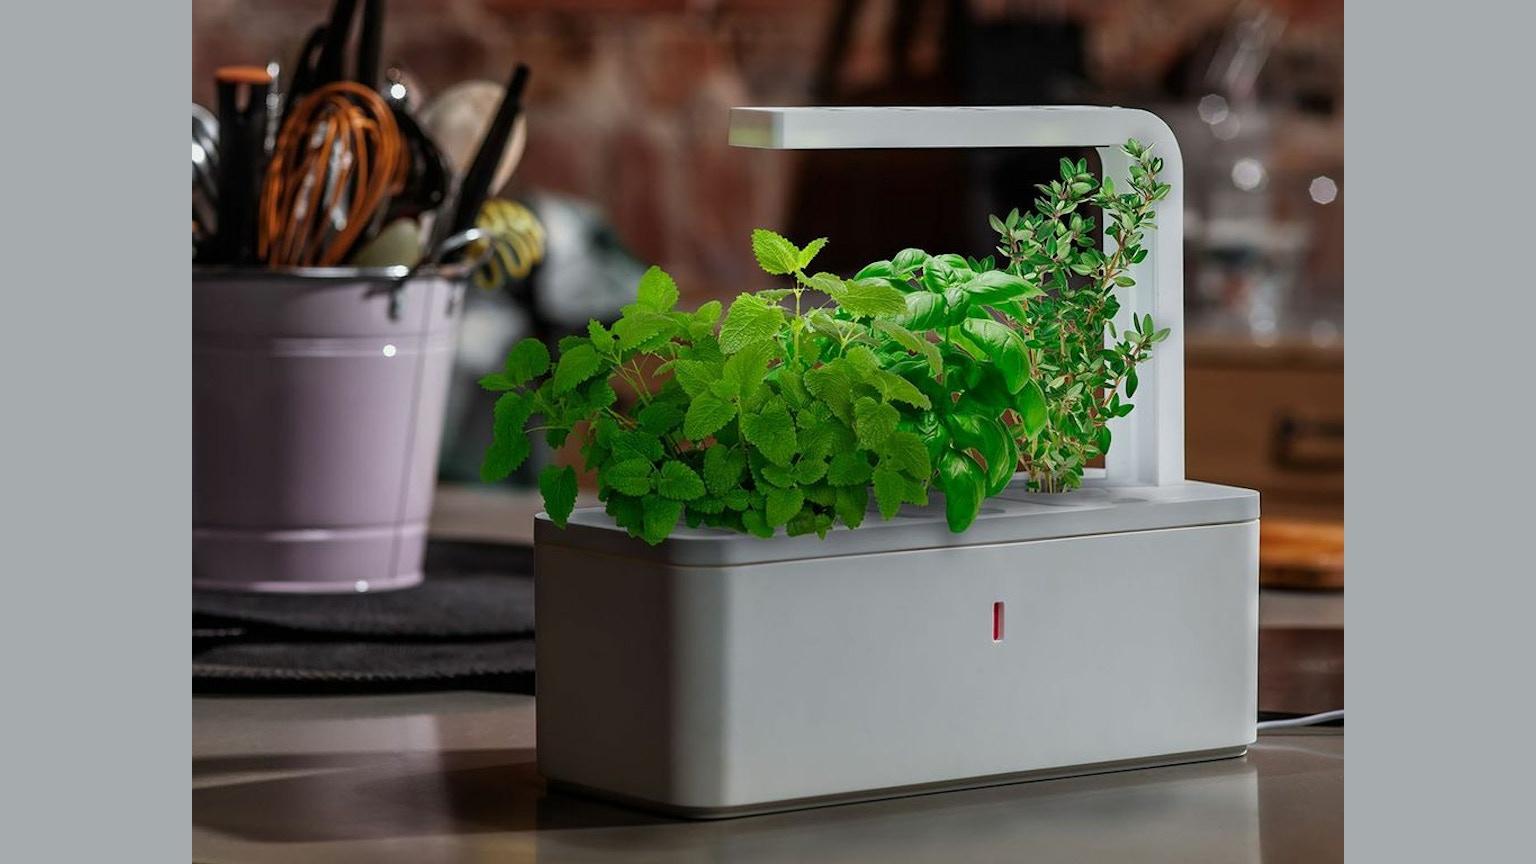 smart herb garden by click grow by click grow kickstarter. Black Bedroom Furniture Sets. Home Design Ideas